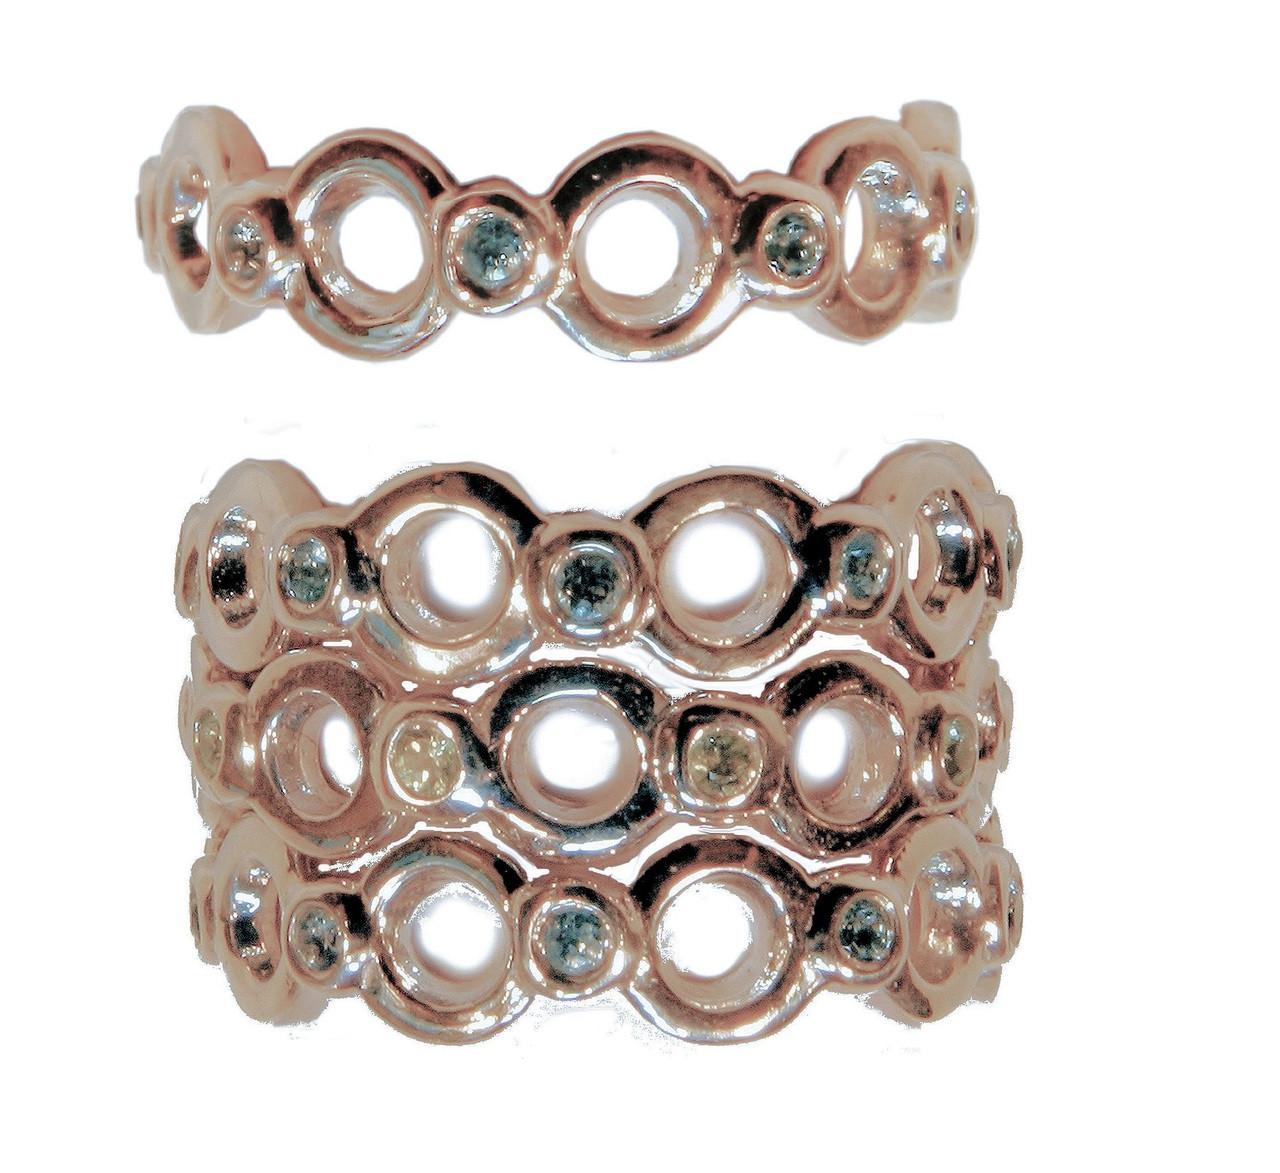 Circle Dot Stacking Ring - Sterling silver- shown in semi precious gemstones